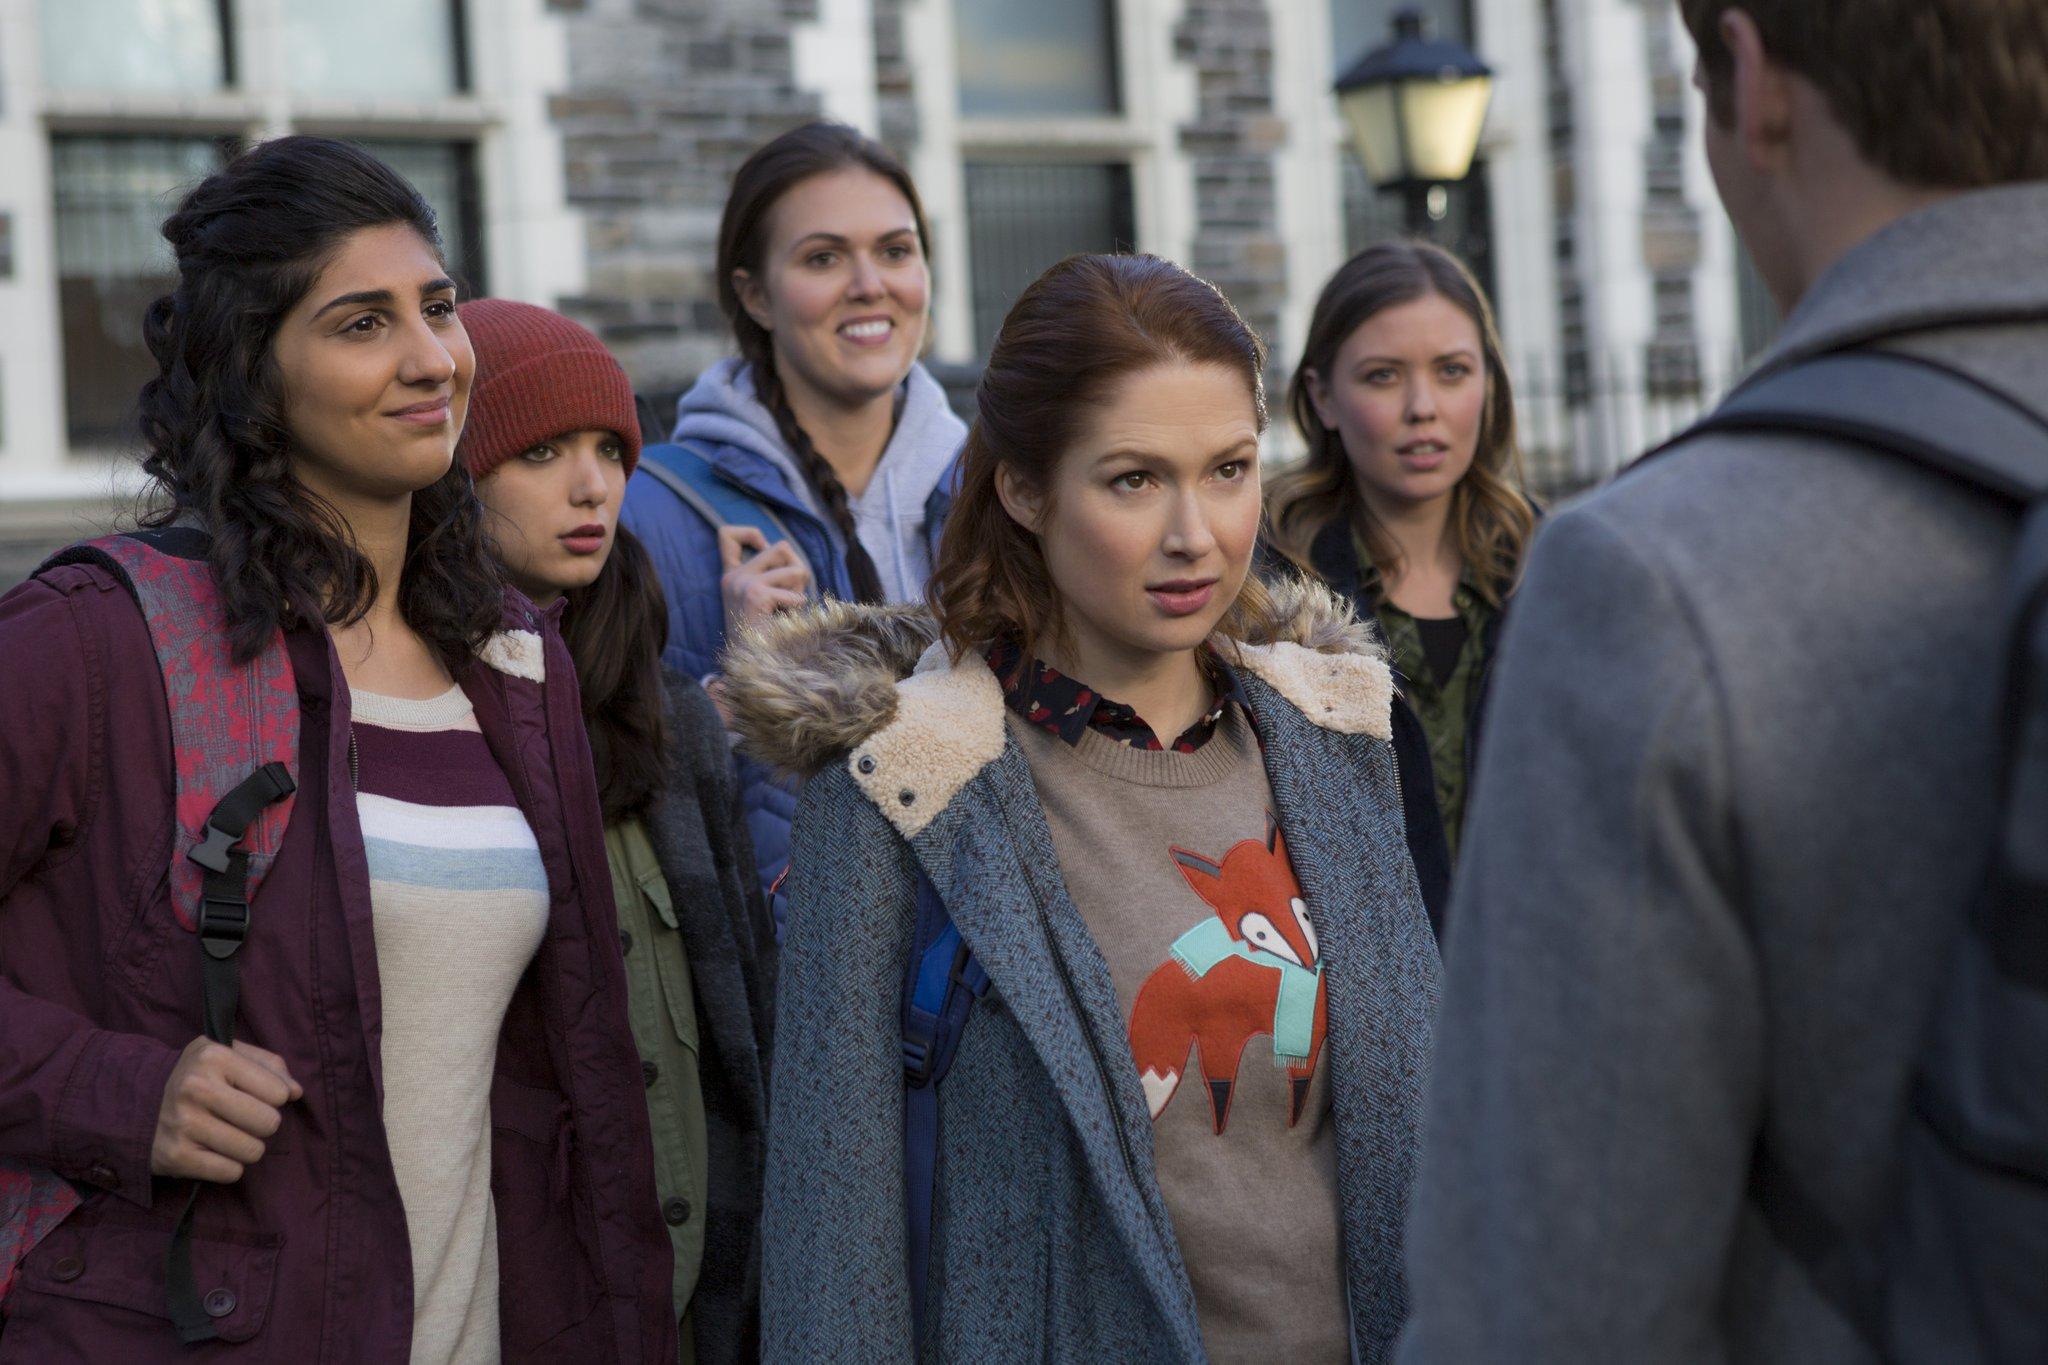 Kimmy se une a un grupo de estudiantes activistas